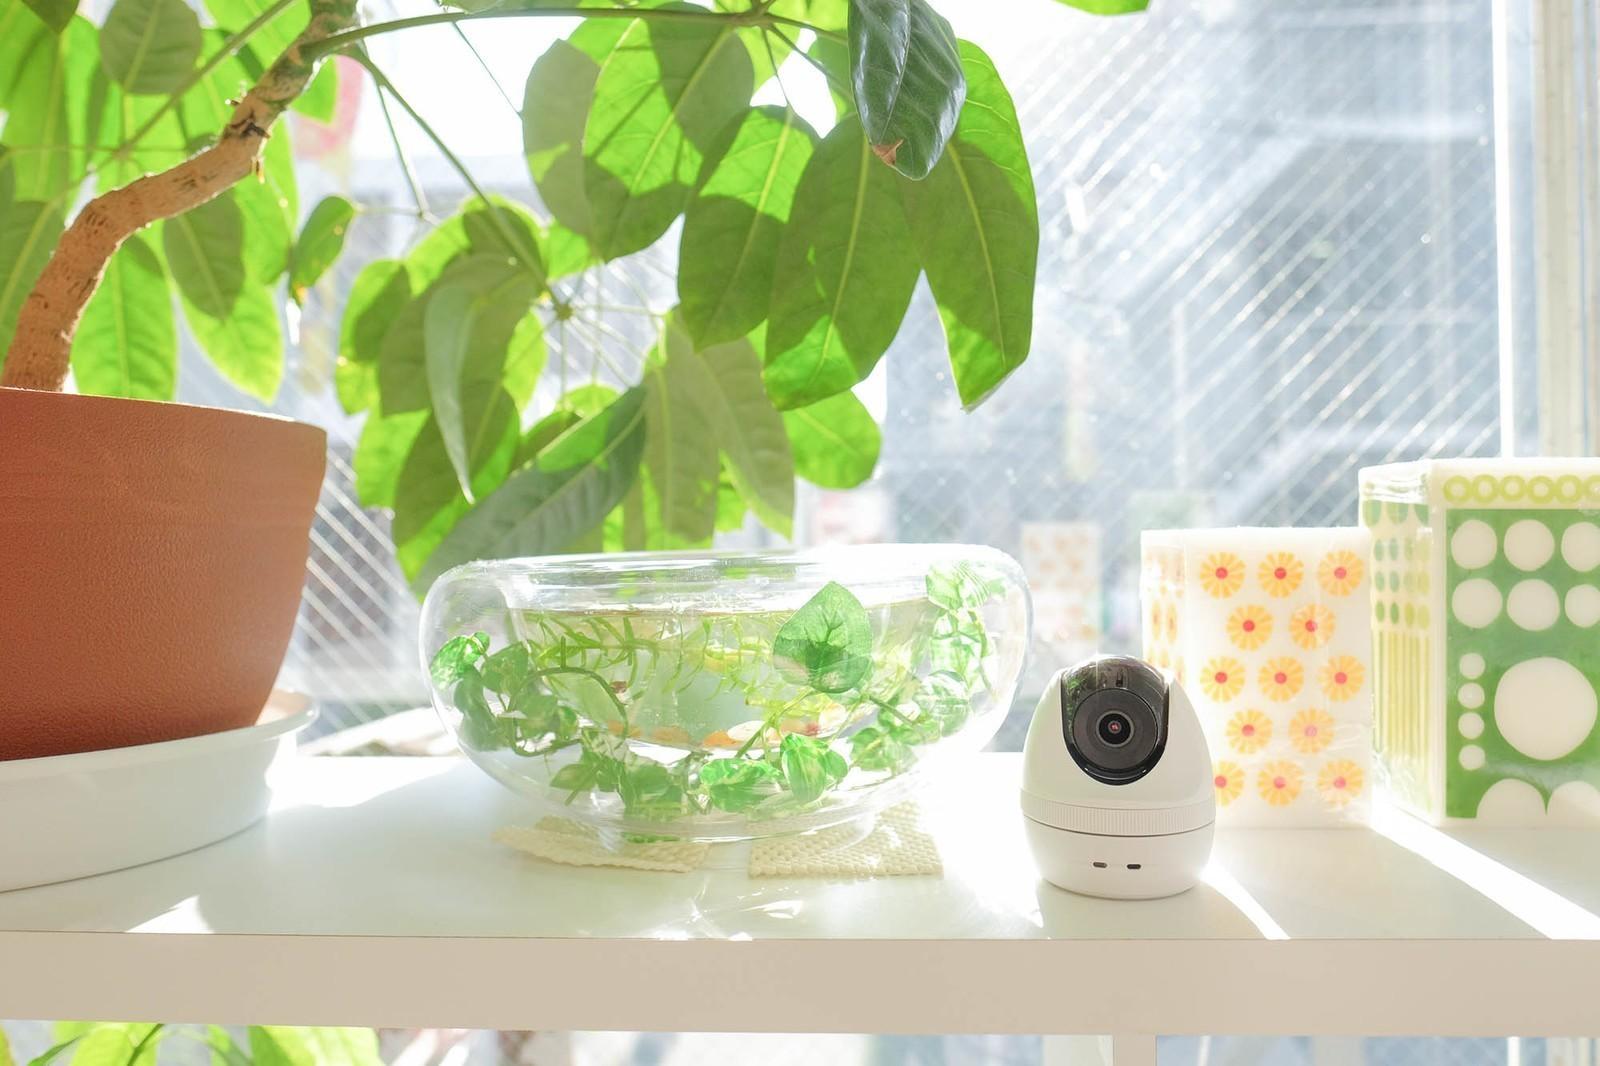 【Android】スマホと監視カメラを活用、クラウド型セキュリティーサービス「Safie」のアプリエンジニアを募集!